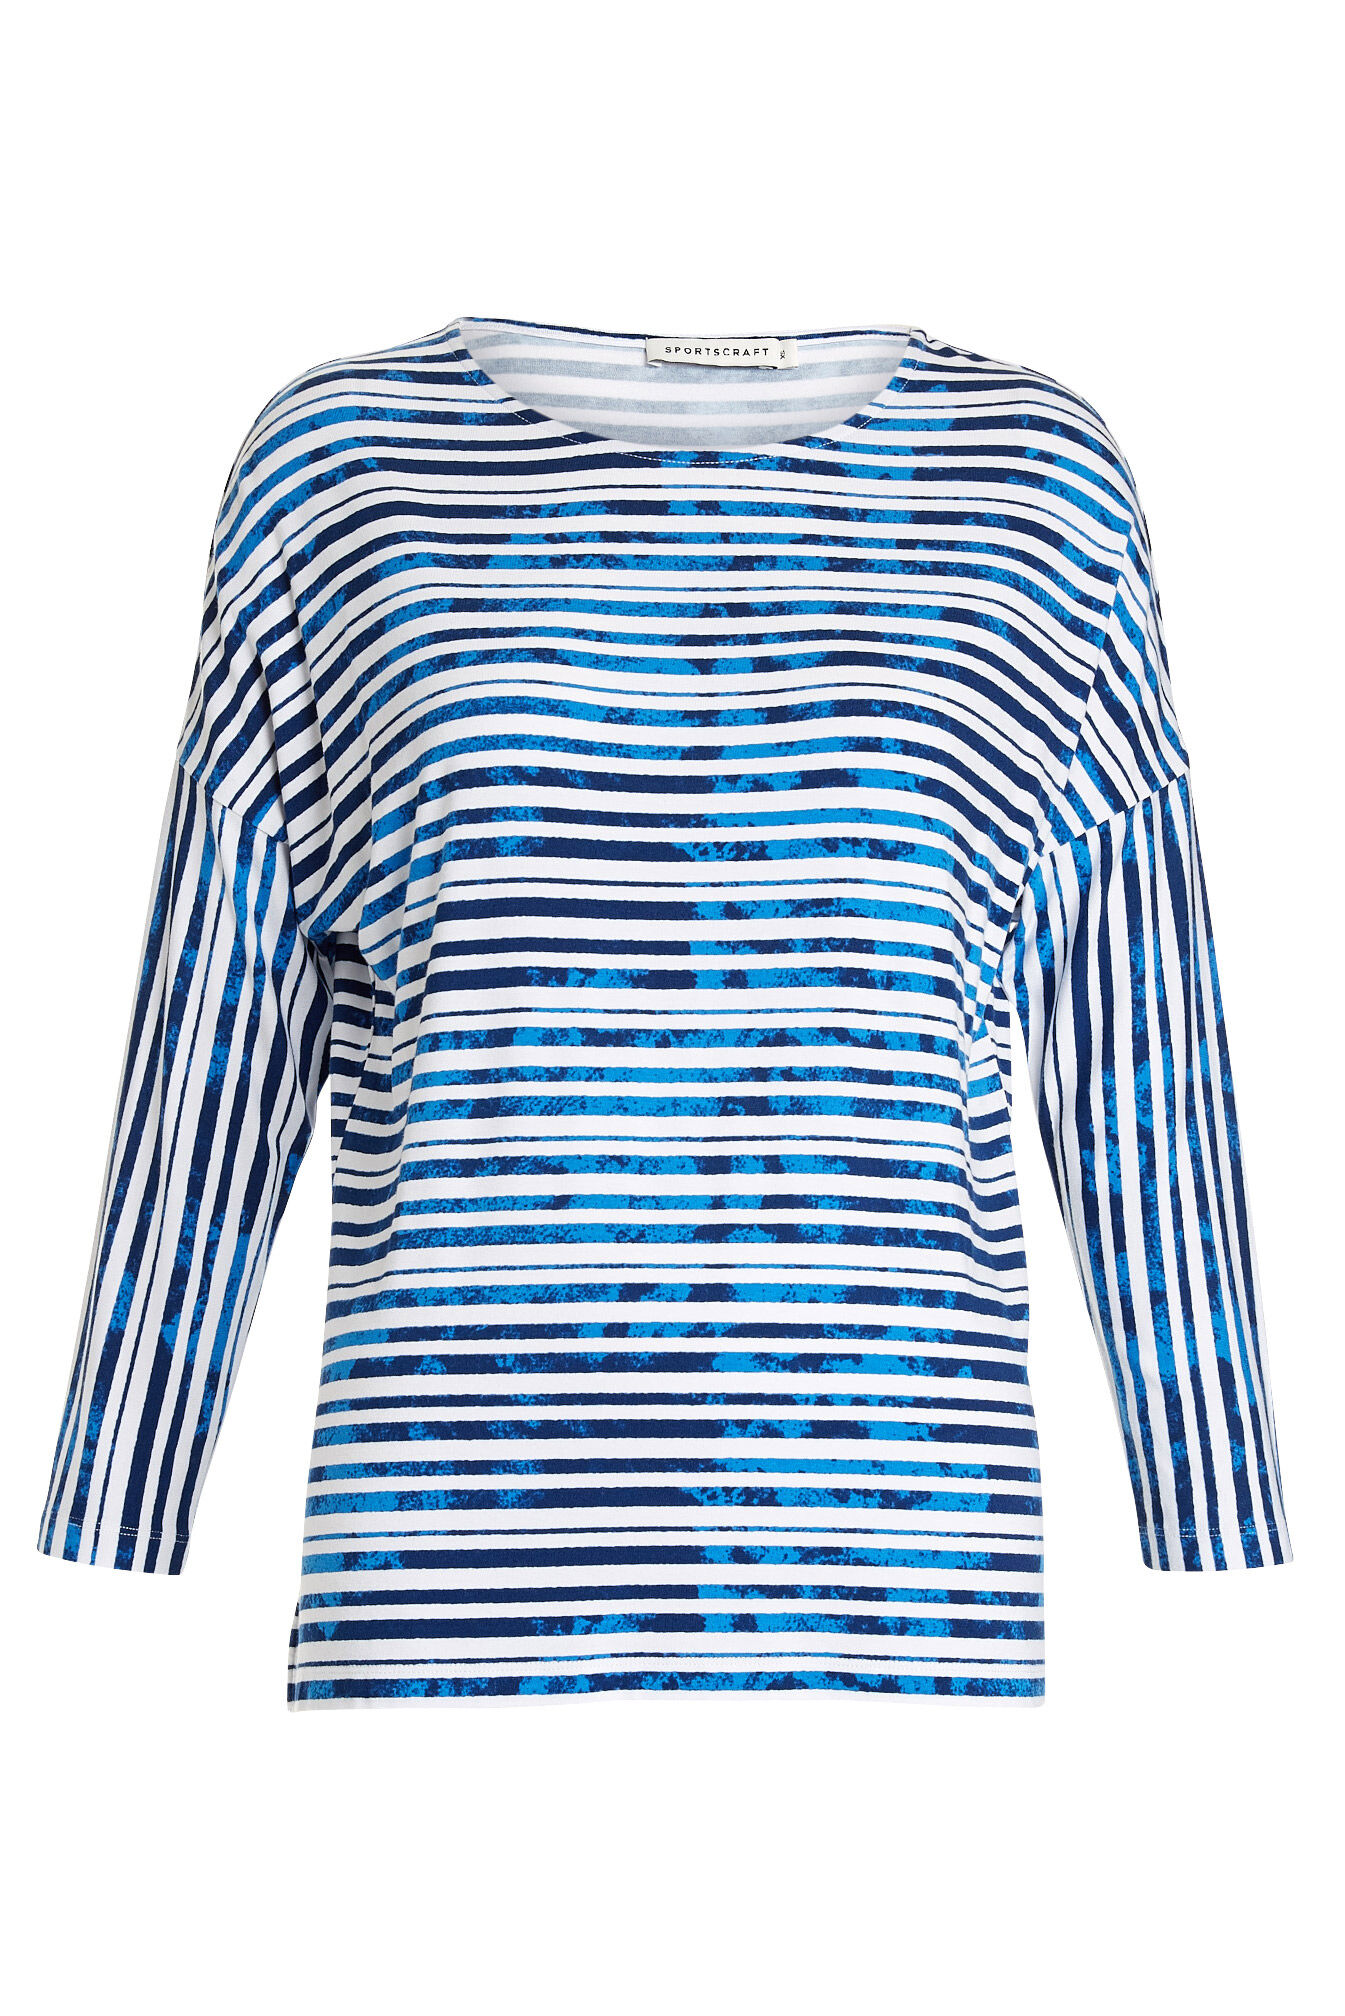 NEW-Sportscraft-WOMENS-Jessie-Tee-T-Shirts